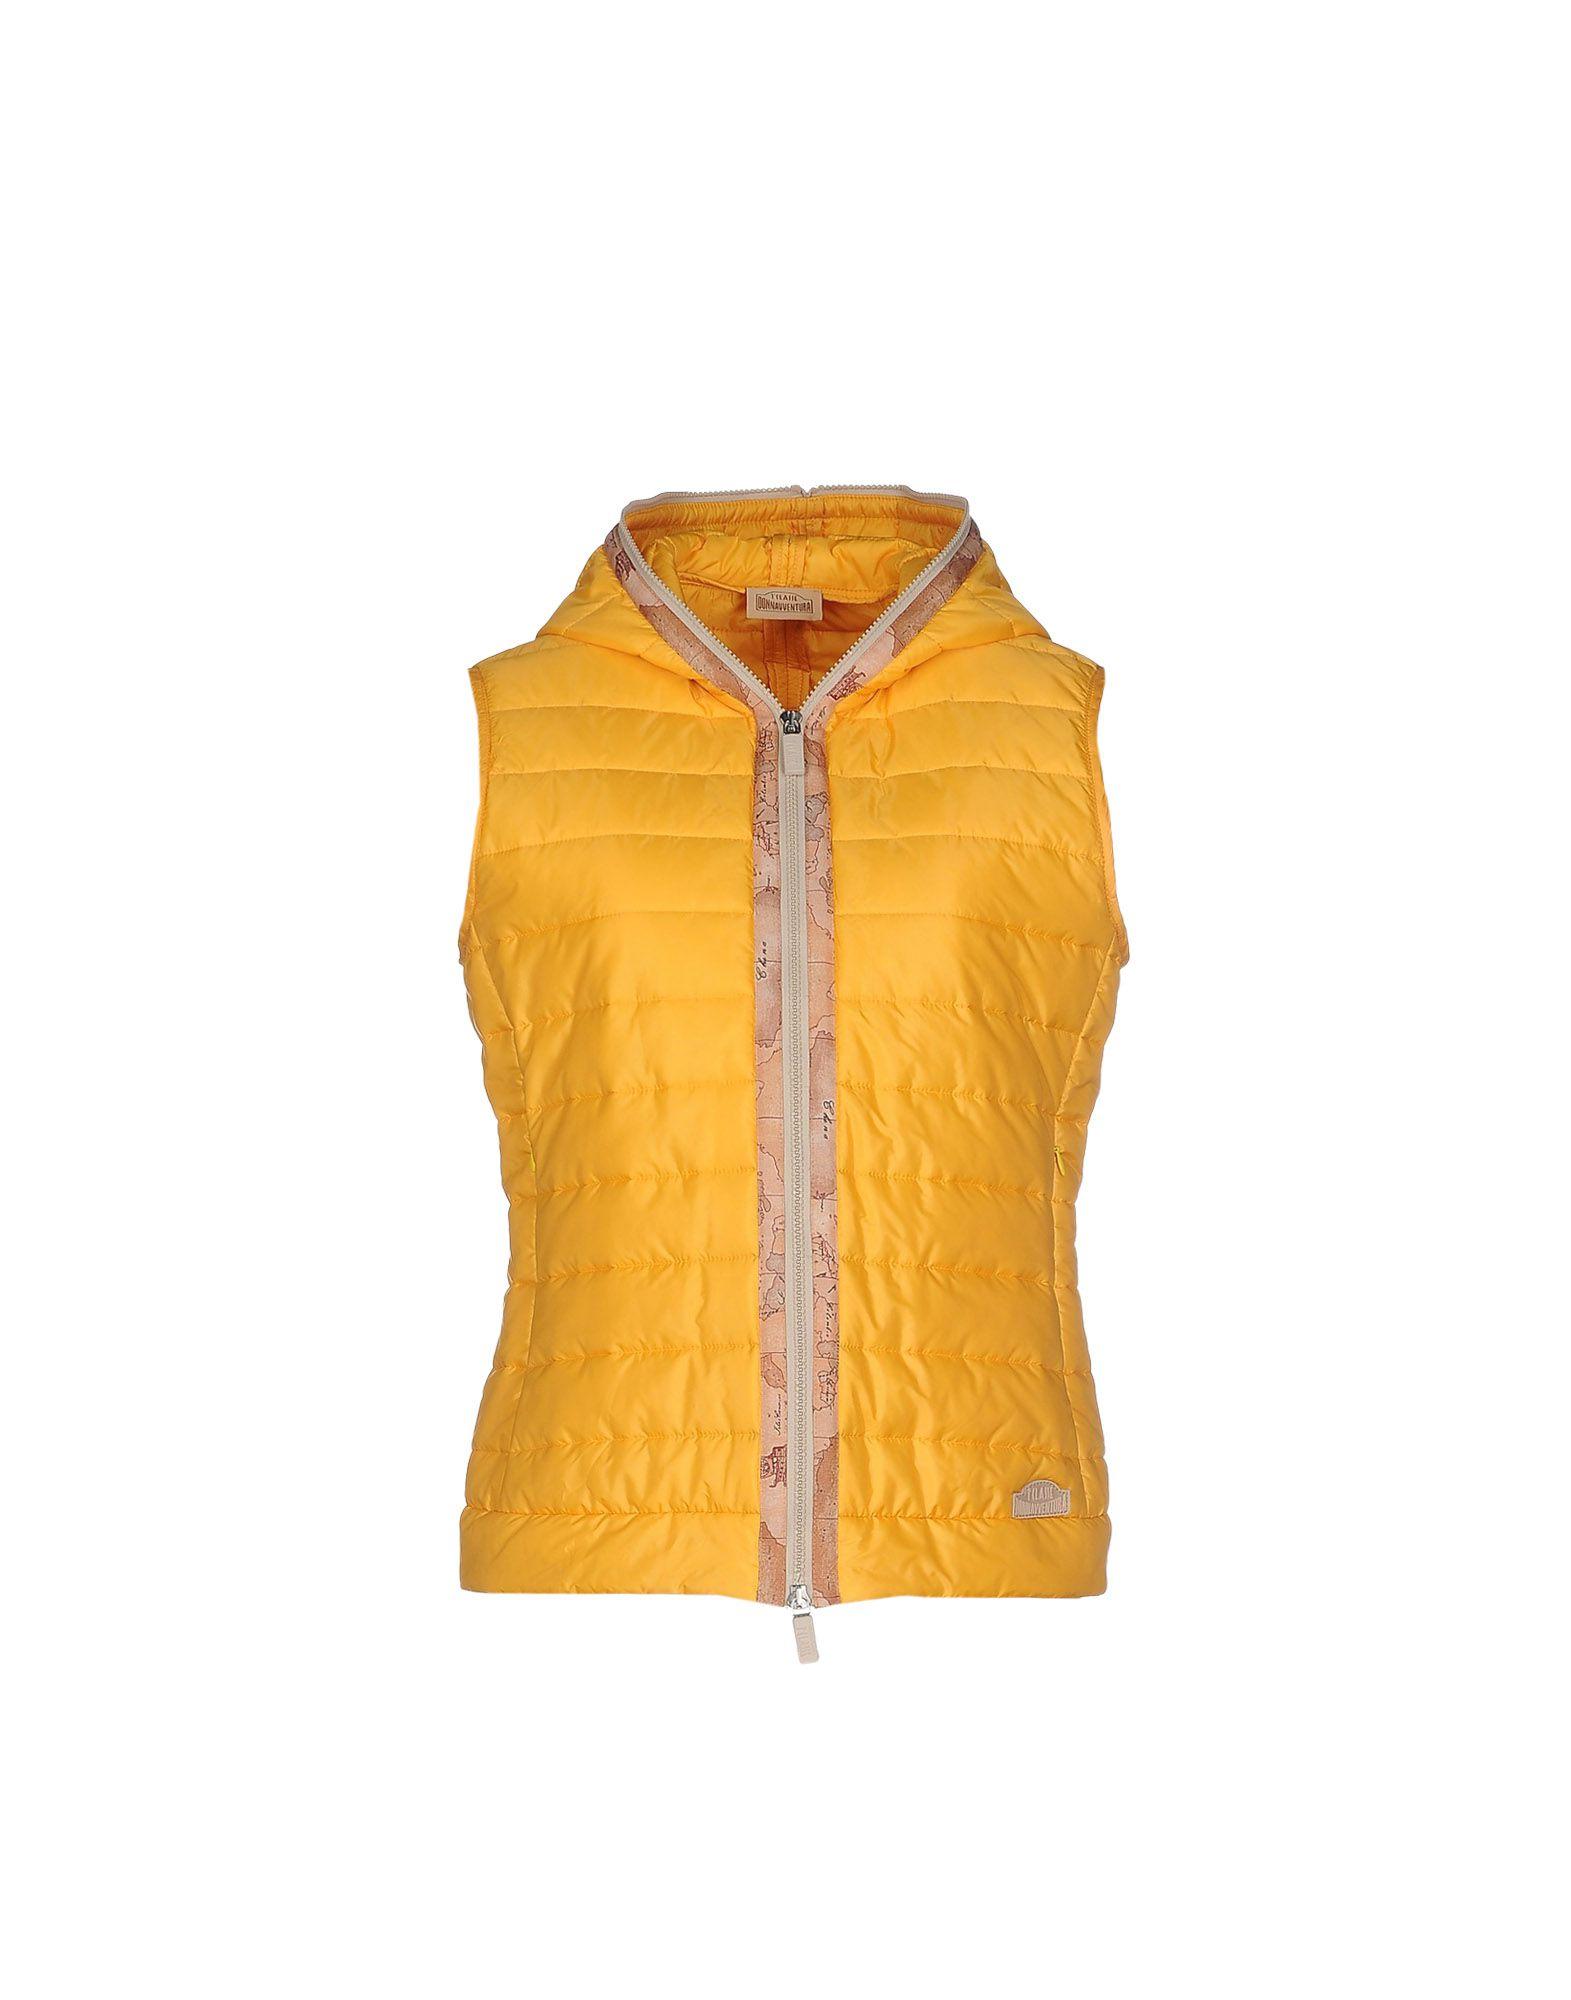 DONNAVVENTURA BY ALVIERO MARTINI 1A CLASSE Jackets